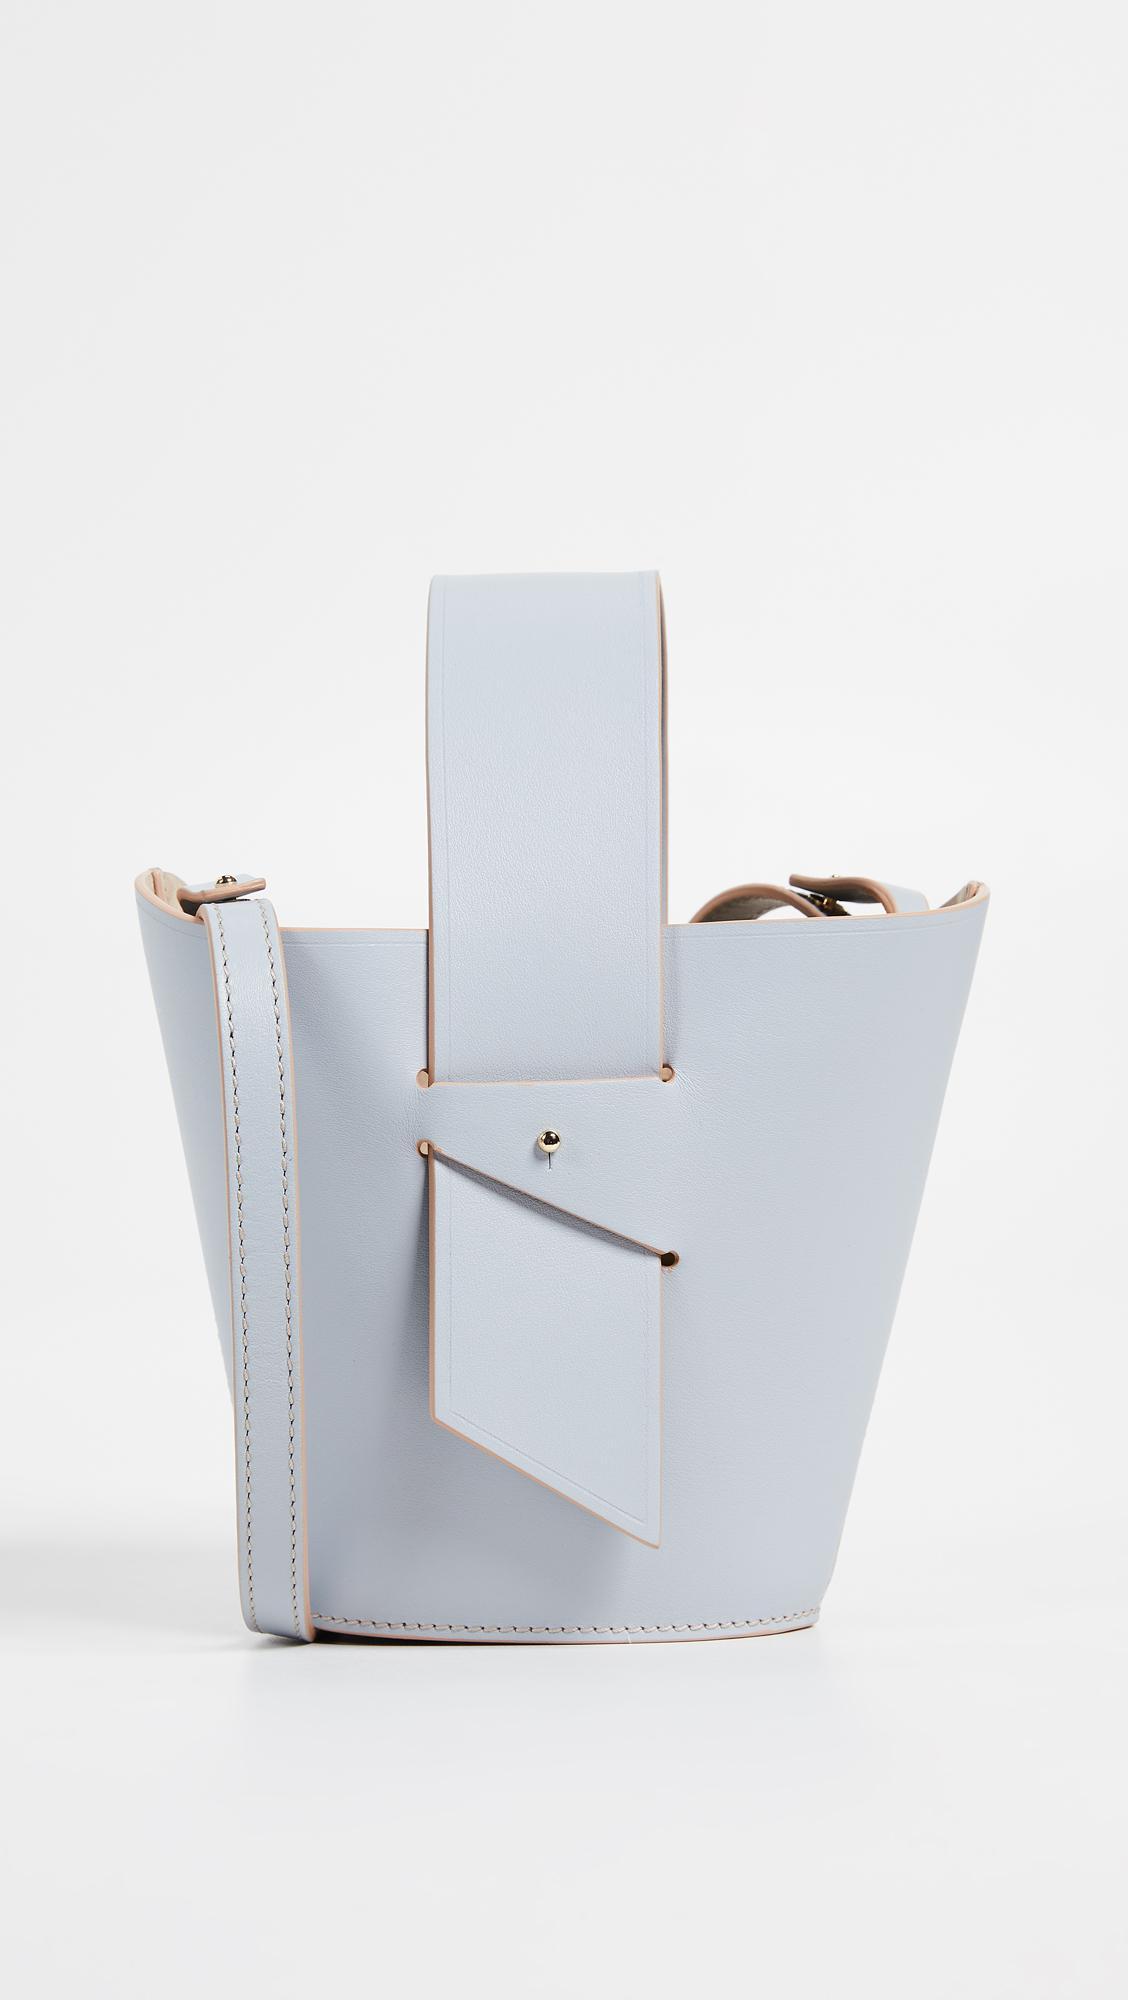 Amphora Mini Shoulder Bag Carolina Santo Domingo Buy Cheap 100% Guaranteed Discounts Outlet Excellent Recommend Sale Online Outlet Real dlPv8rkgF